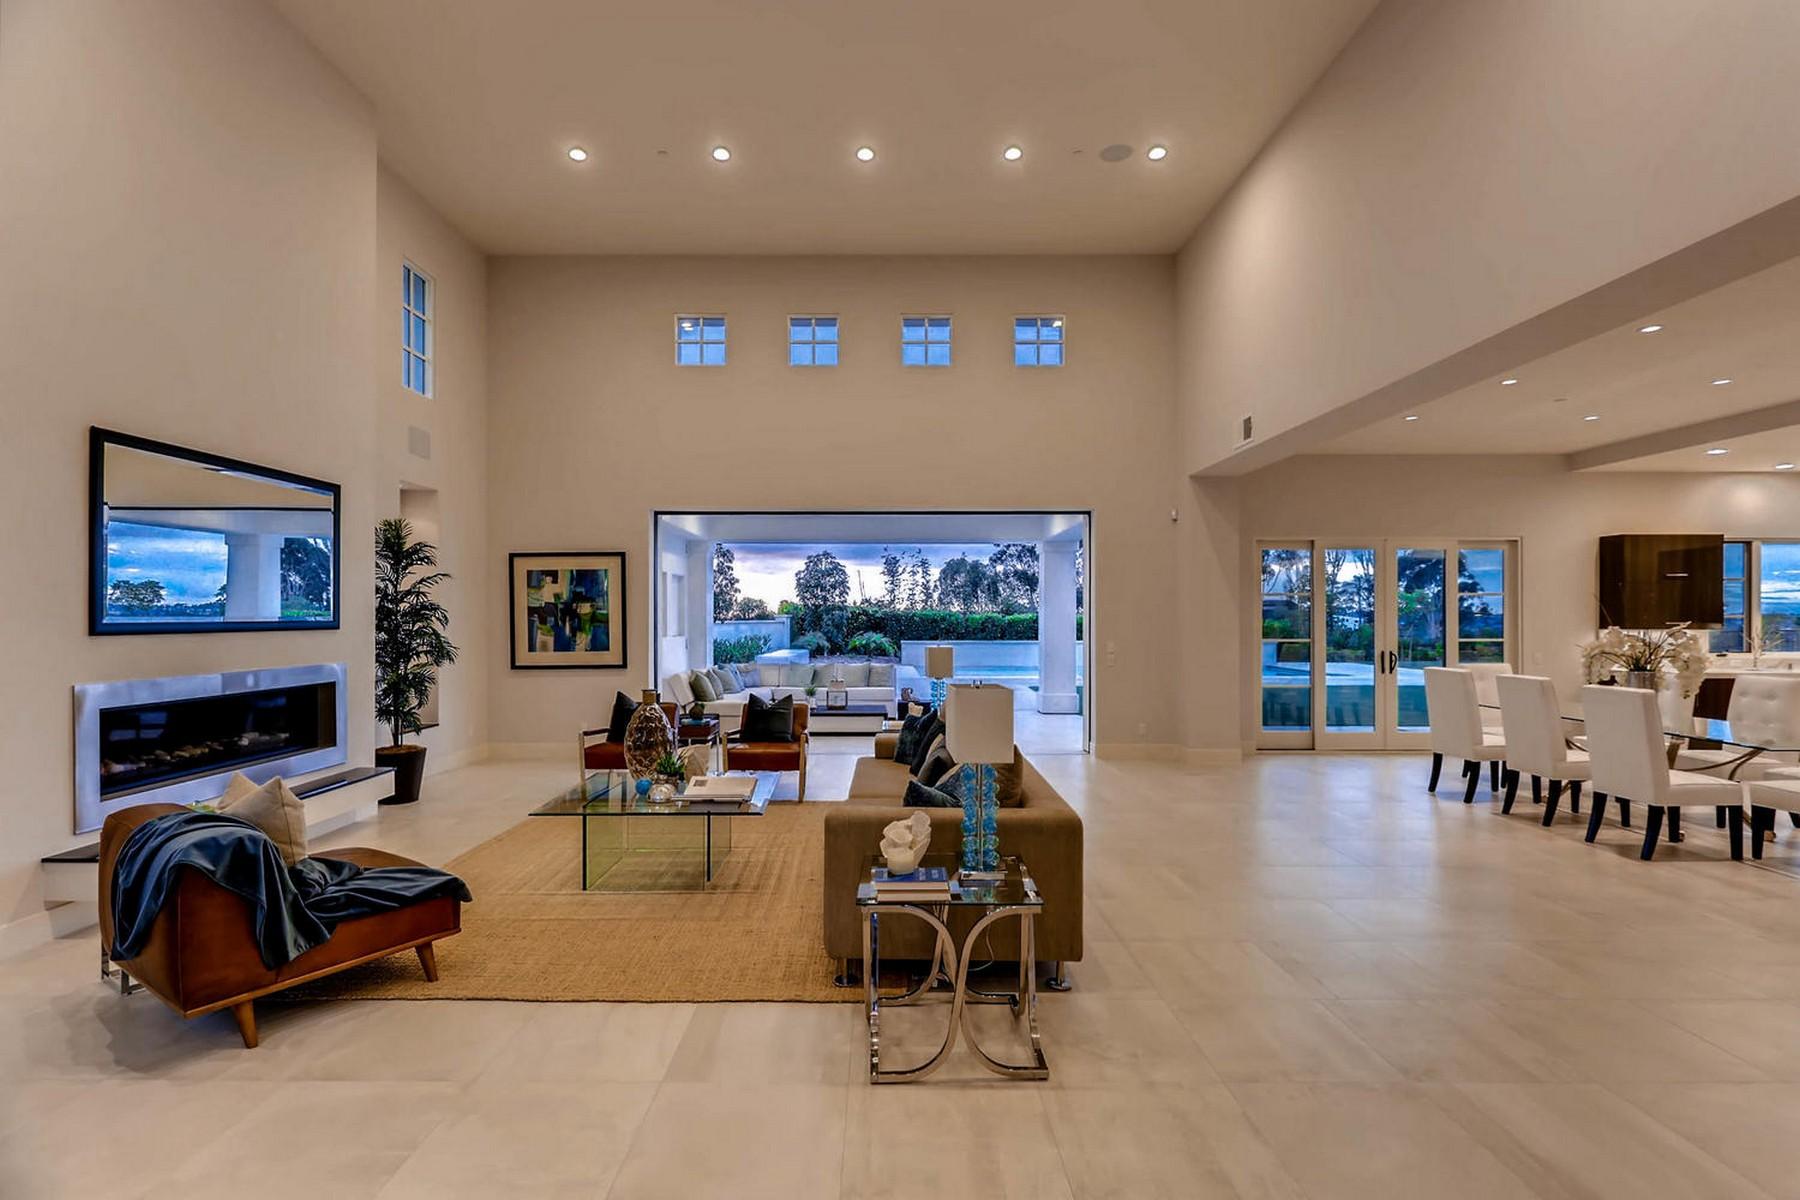 Additional photo for property listing at 6370 Carmel View South Street  San Diego, Калифорния 92130 Соединенные Штаты